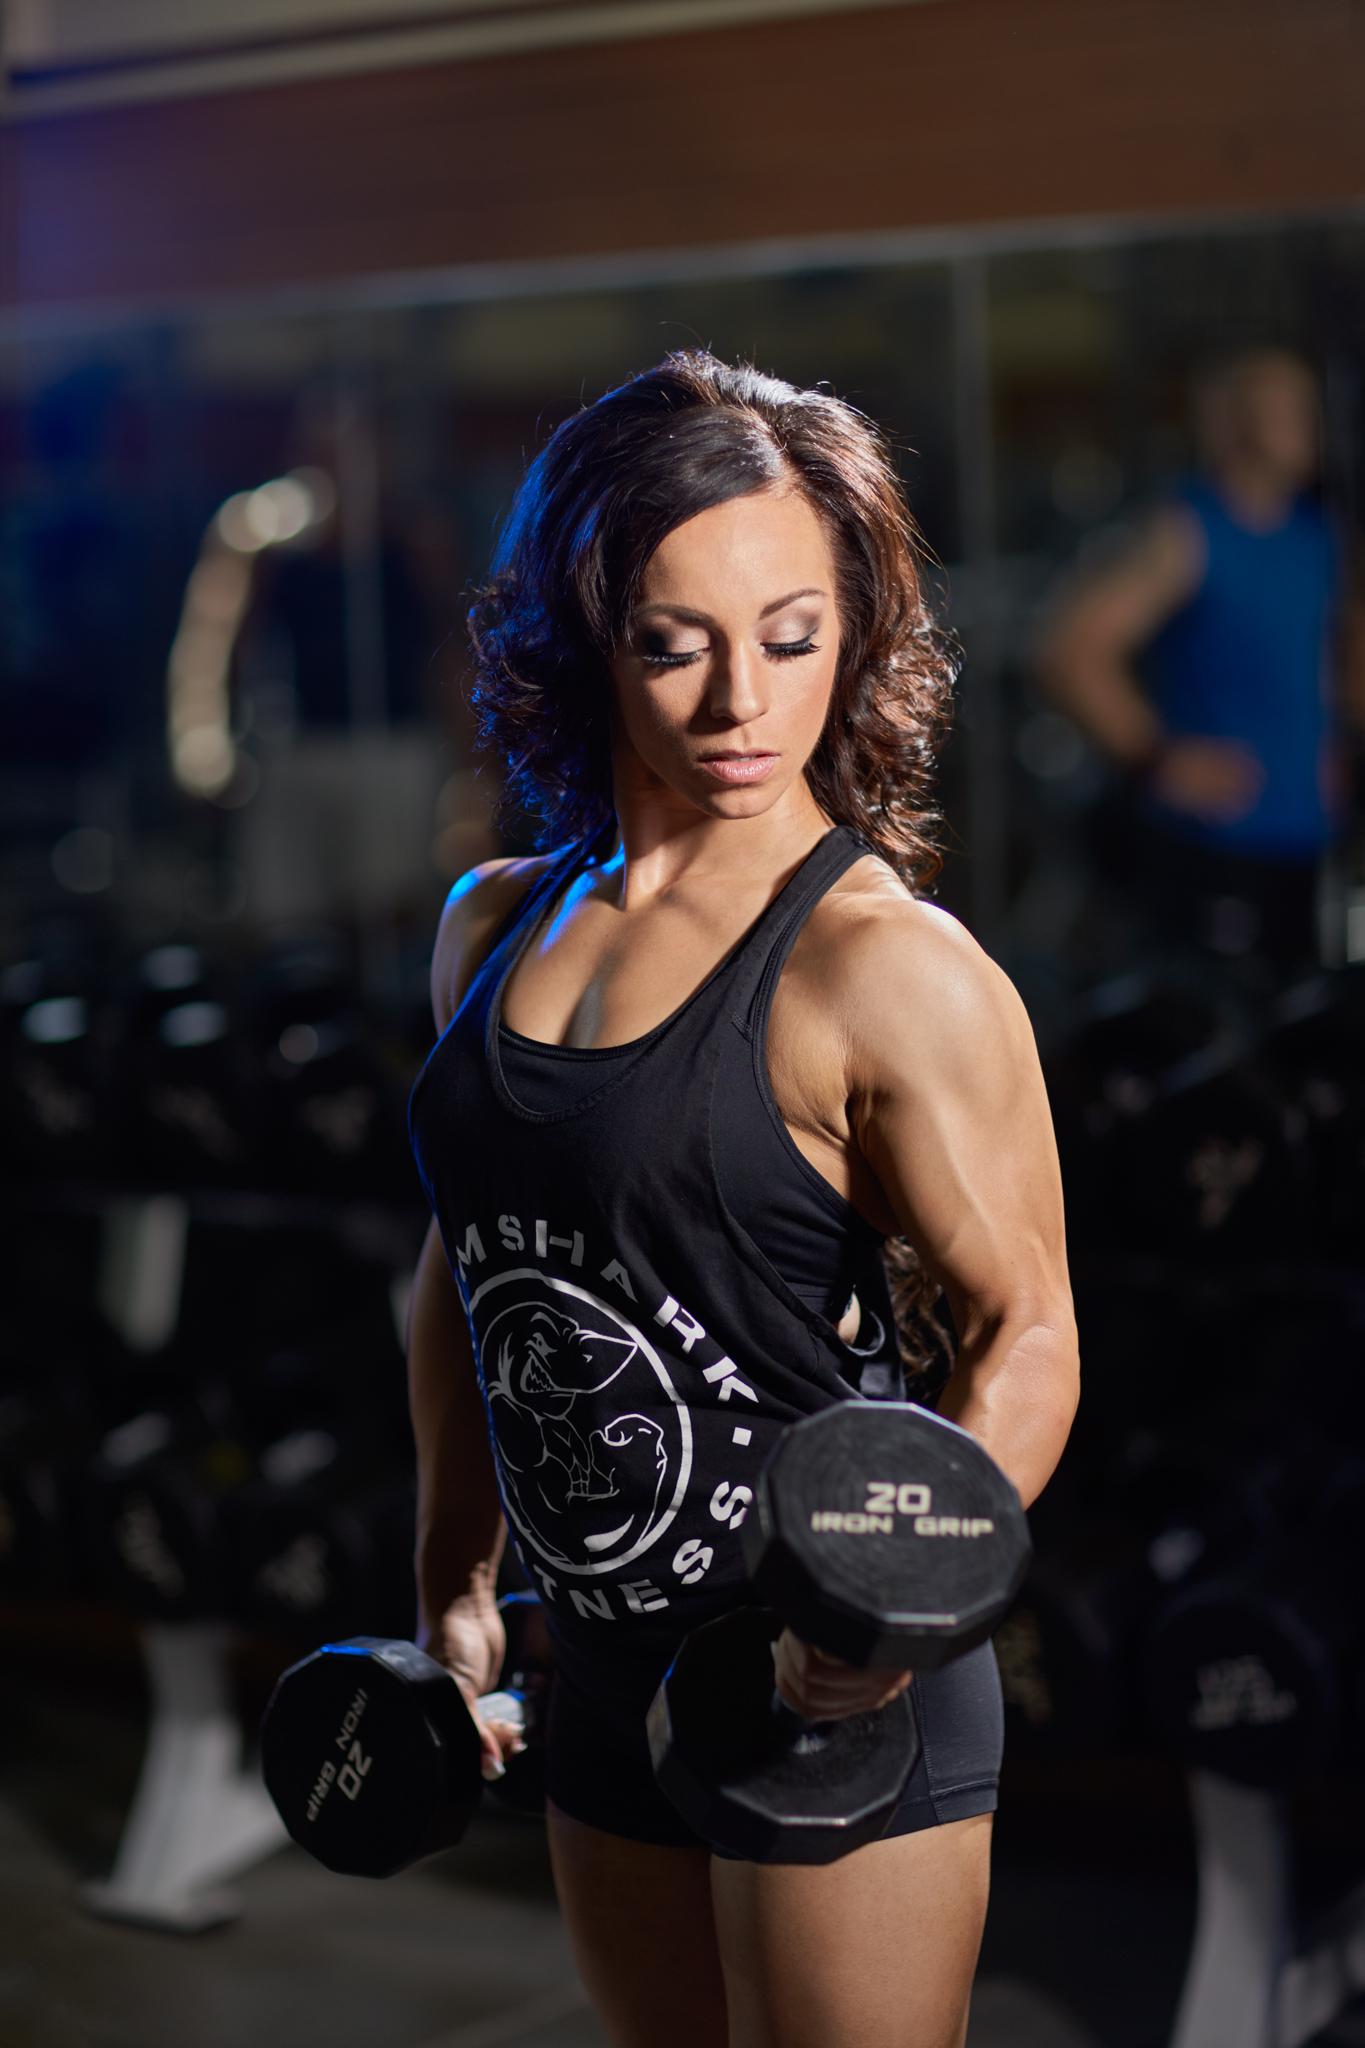 Kayley gym shoot-1251 1.jpg